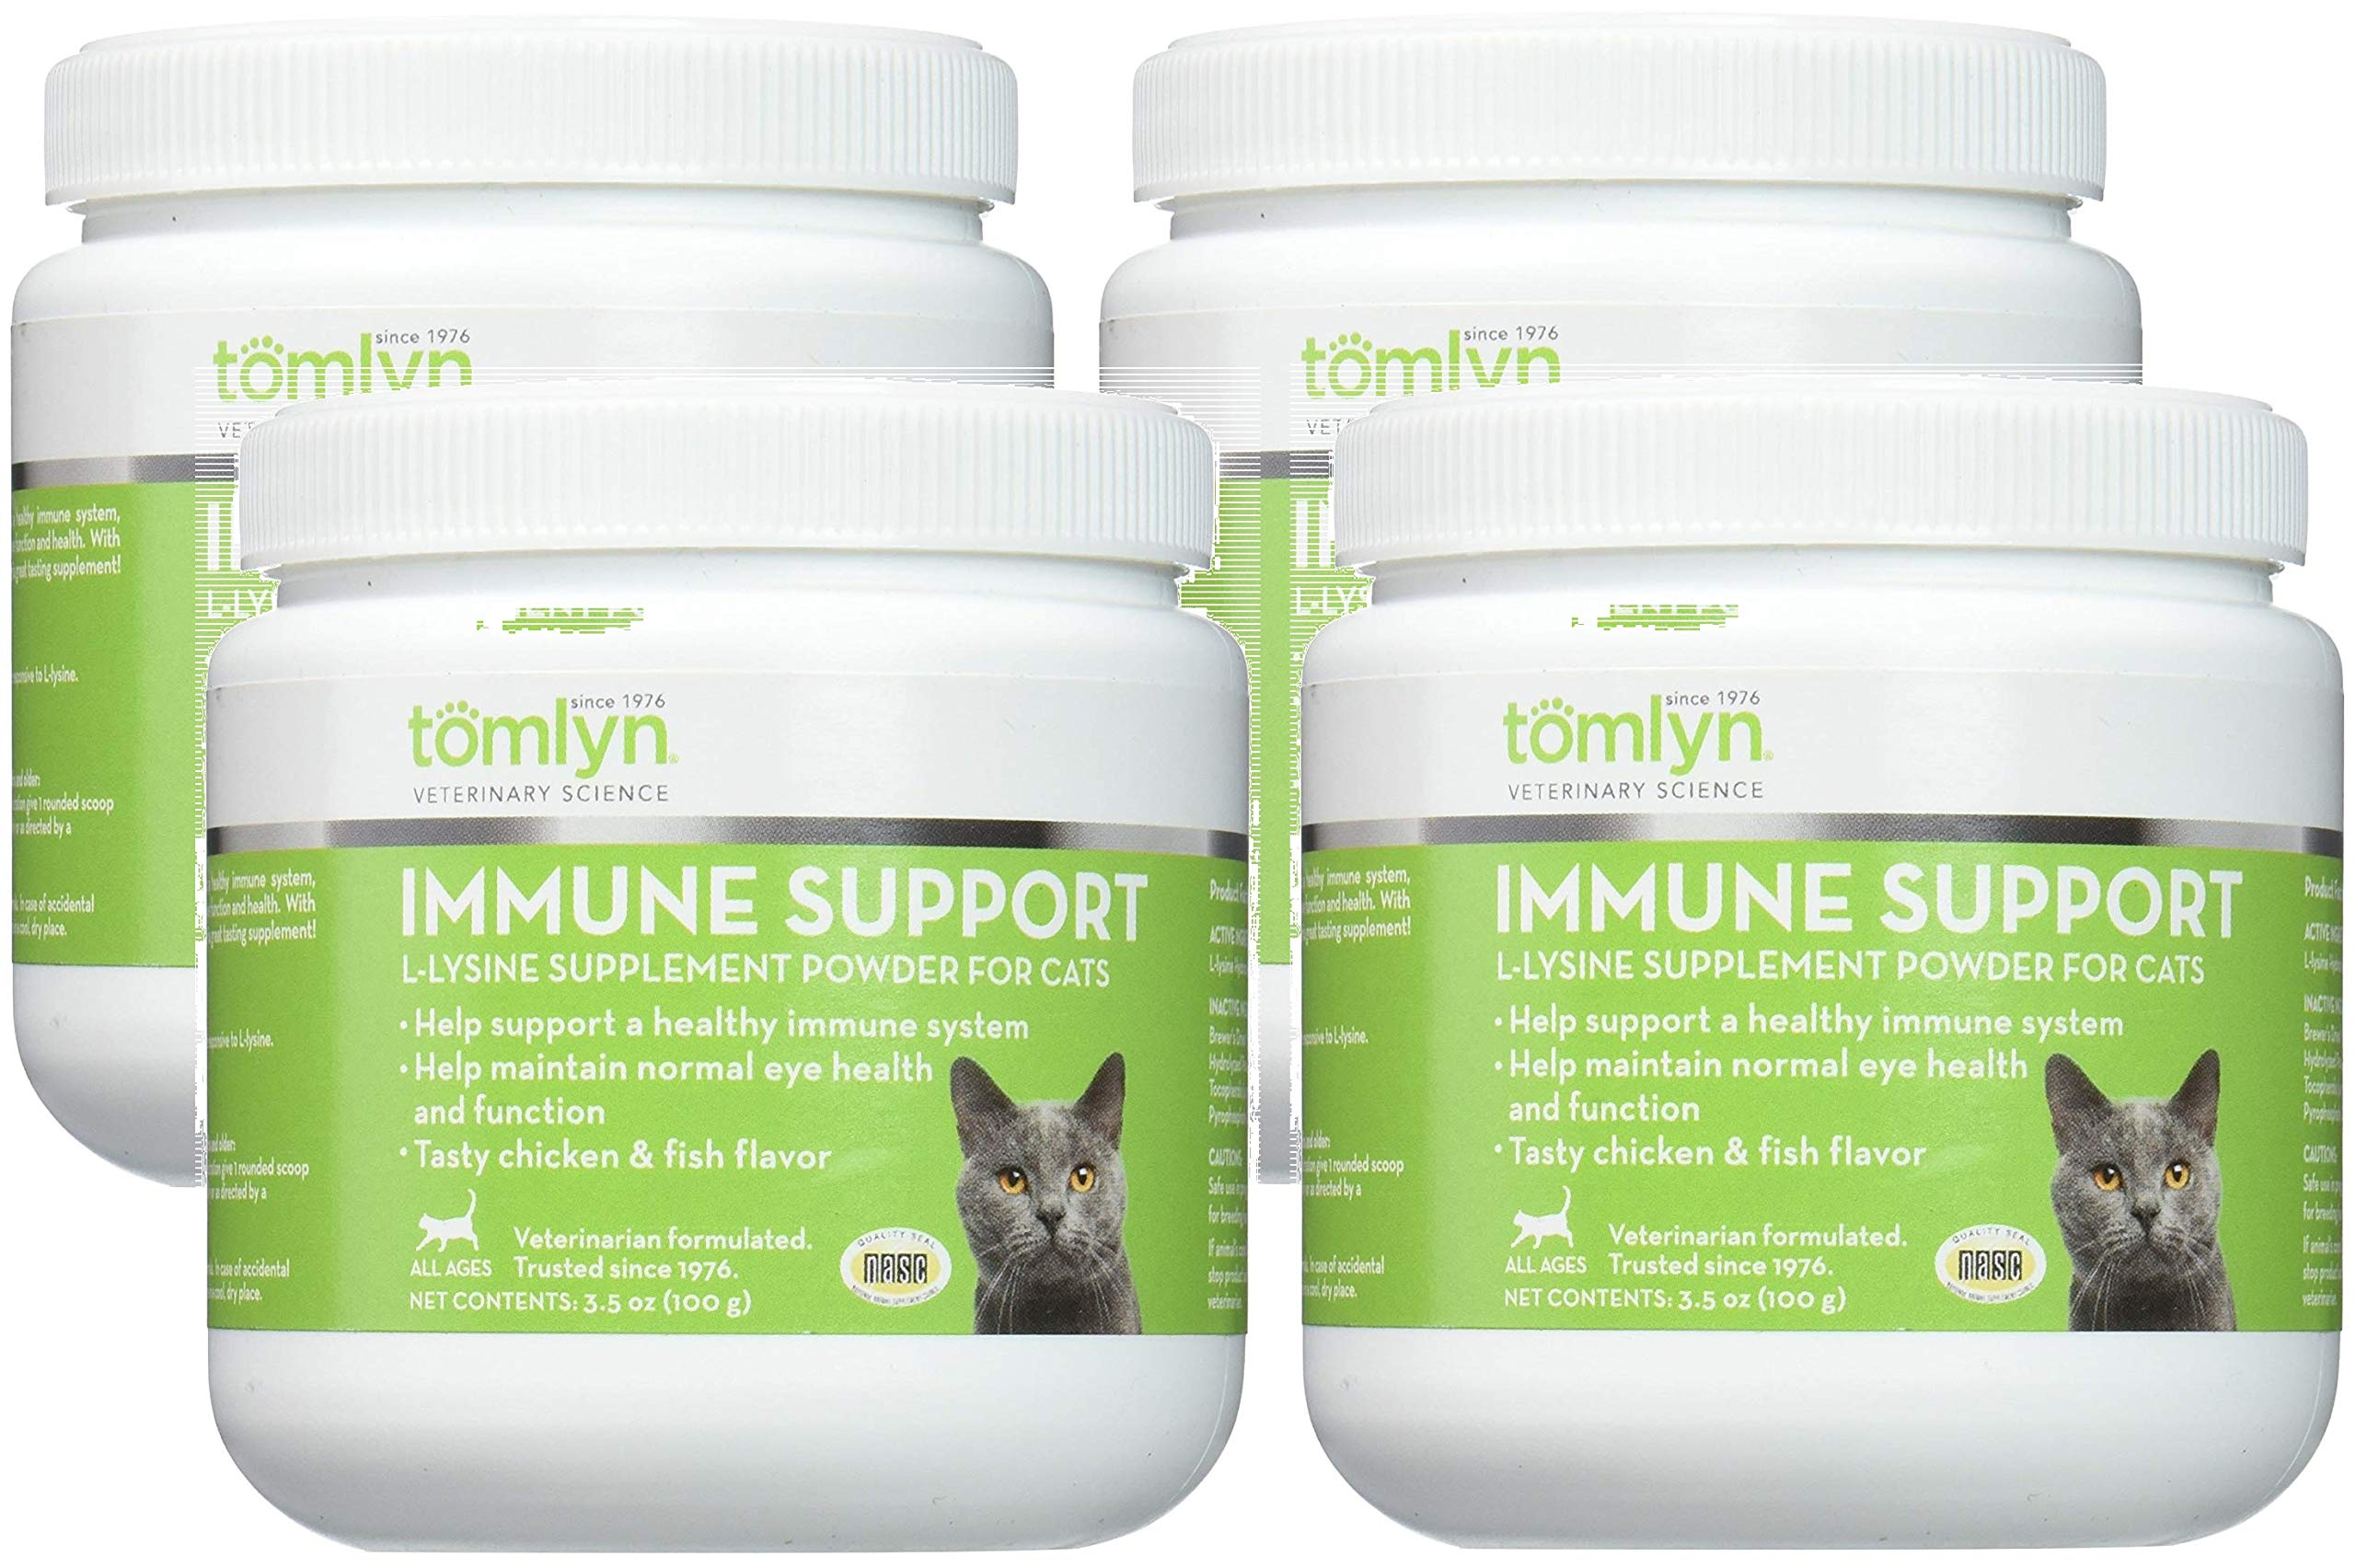 Tomlyn Scientifics L-Lysine Health Supplement Powder for Cats, 100gm Jars (4 Pack) by TOMLYN